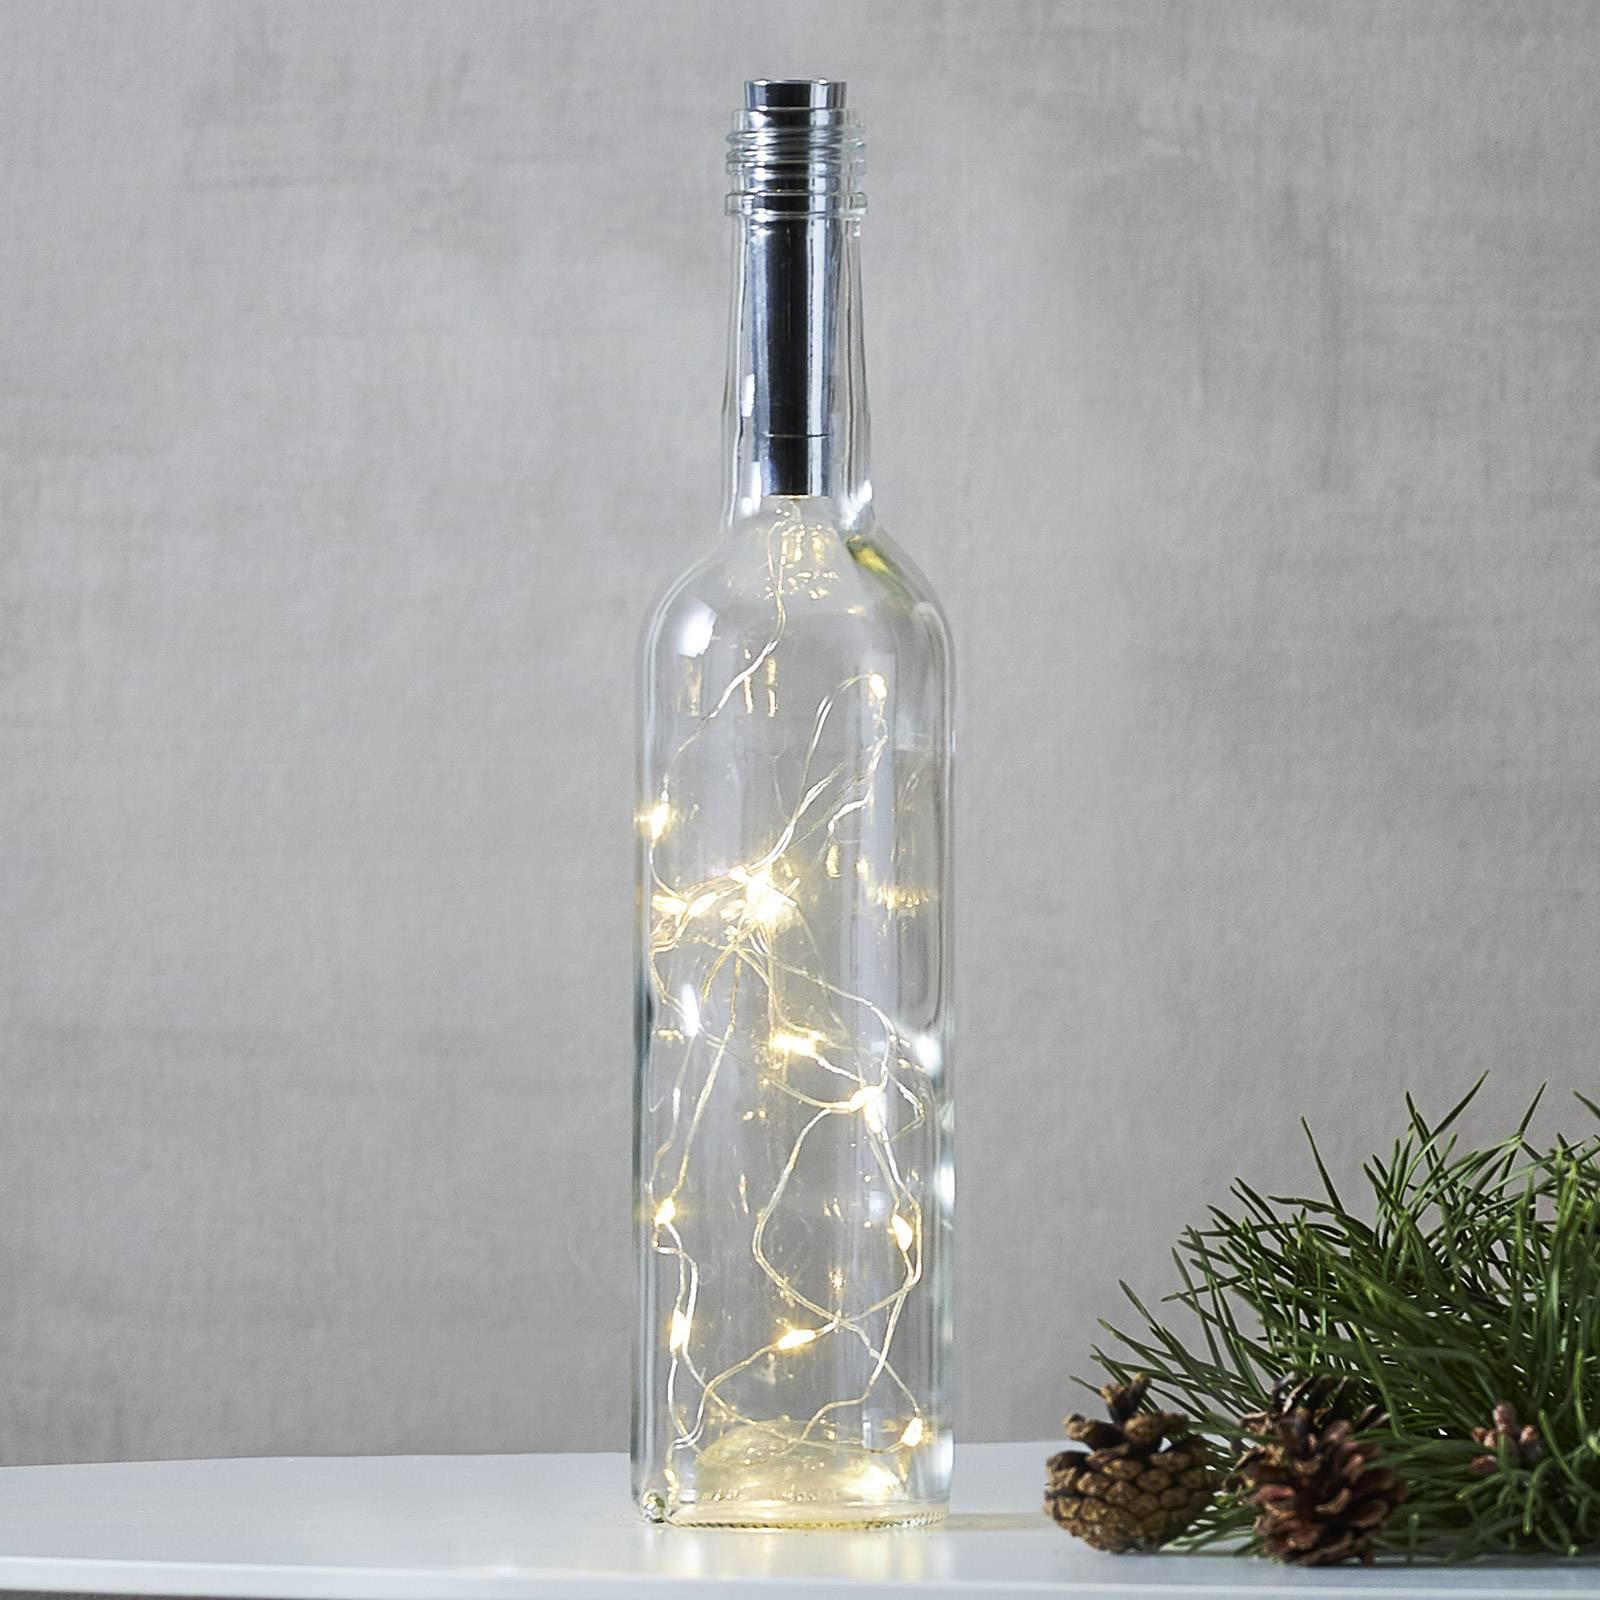 Valoketju Dew Drops pulloihin, 75cm paristo, hopea